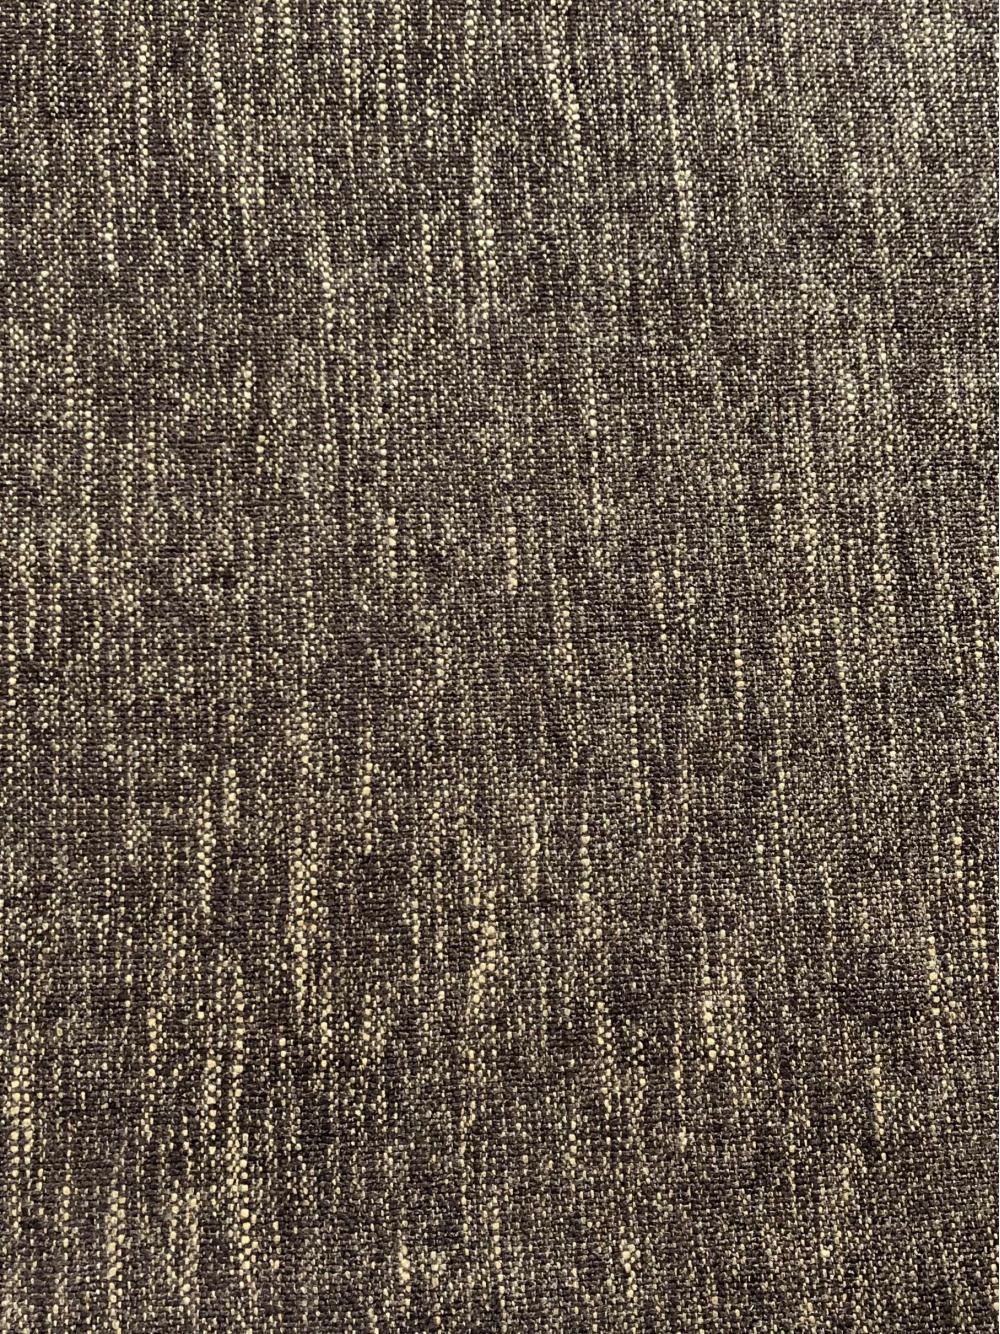 2019 New Design Living Room Furniture Sofa Fabric